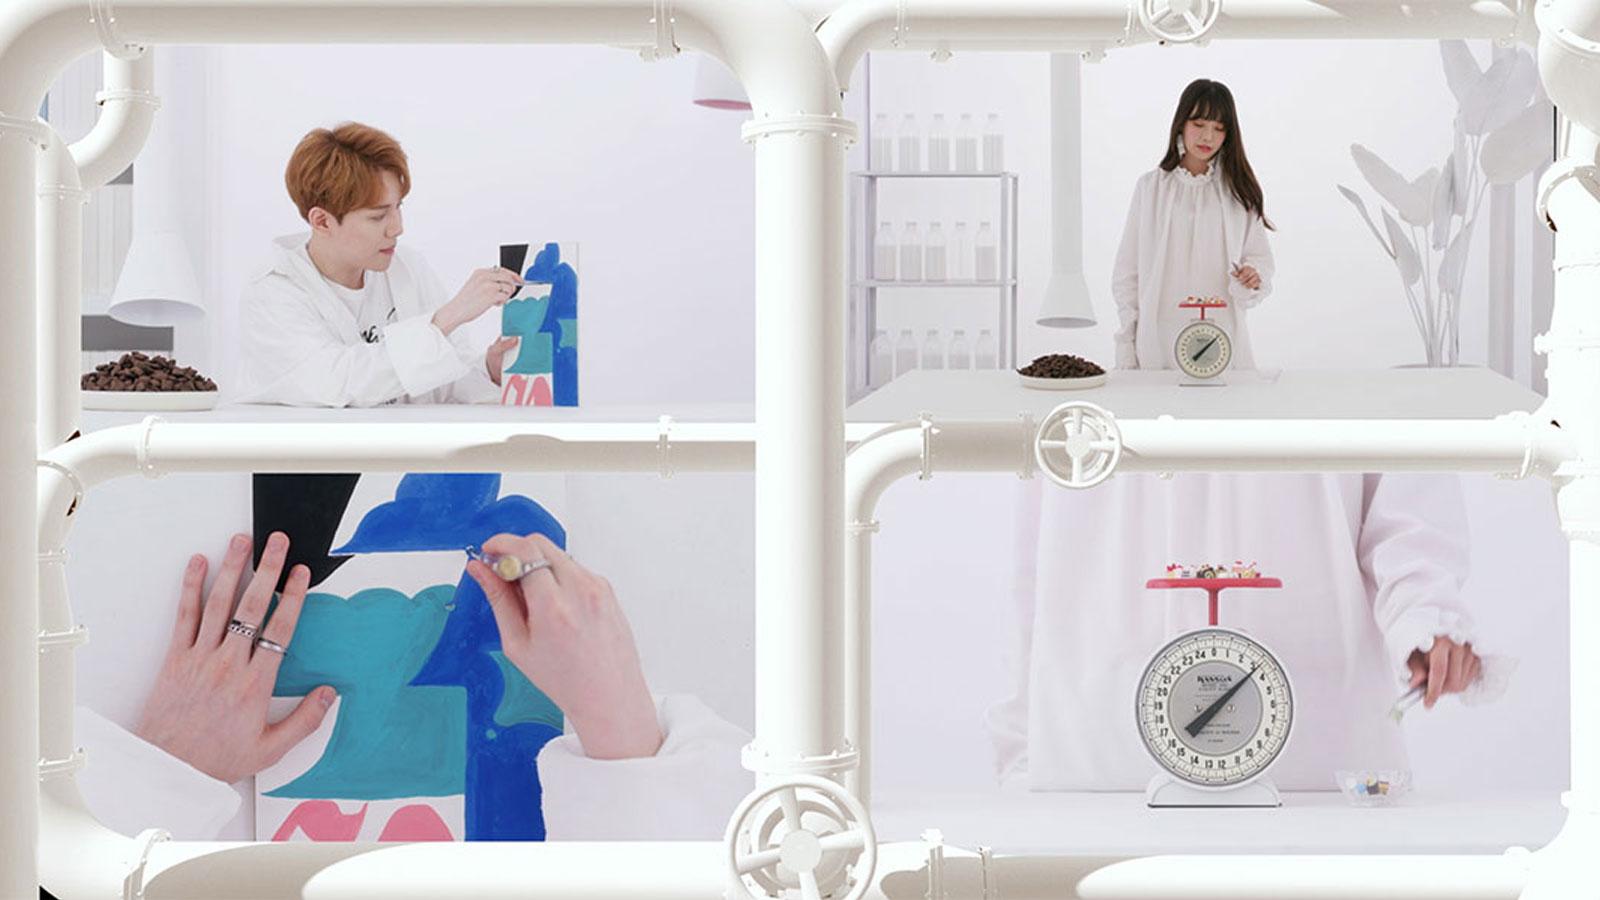 - KELLOGG x park kyung